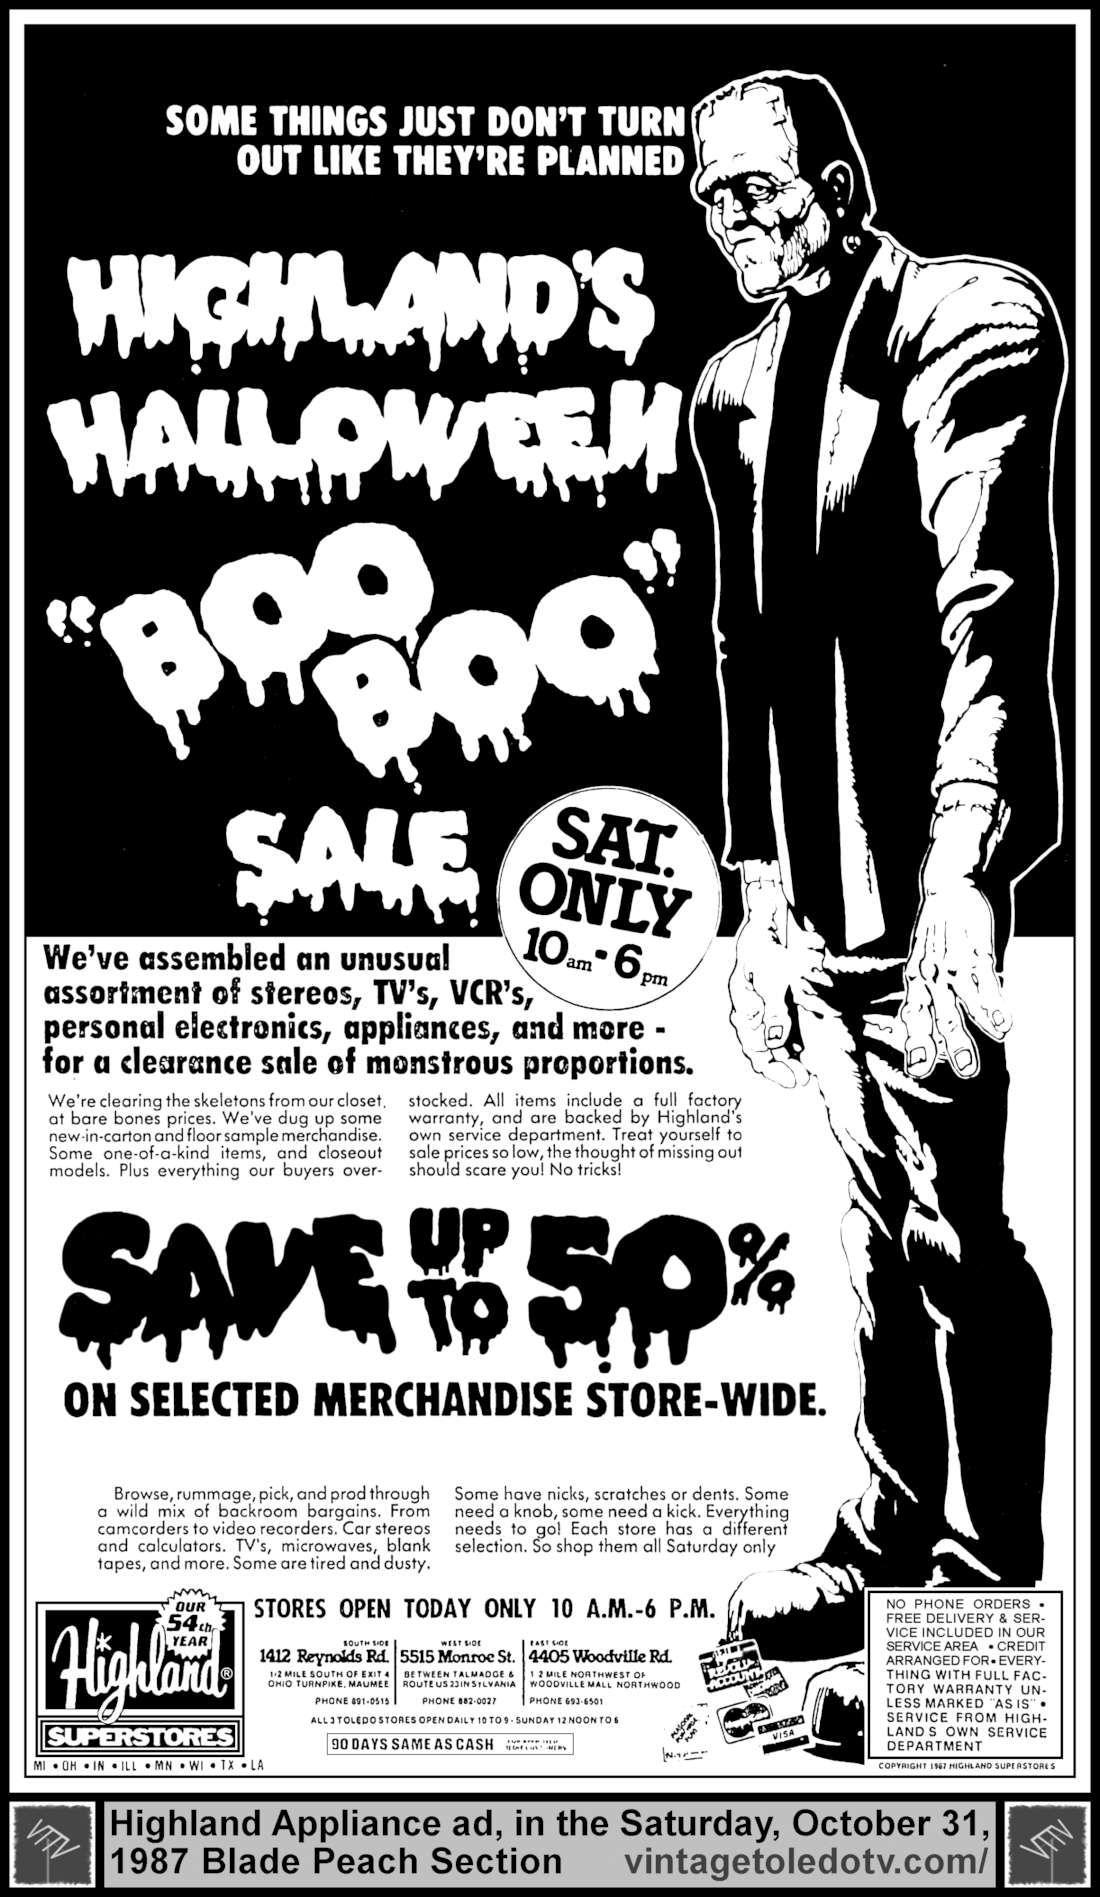 "vintage toledo tv - halloween ads - highland's halloween ""boo boo"